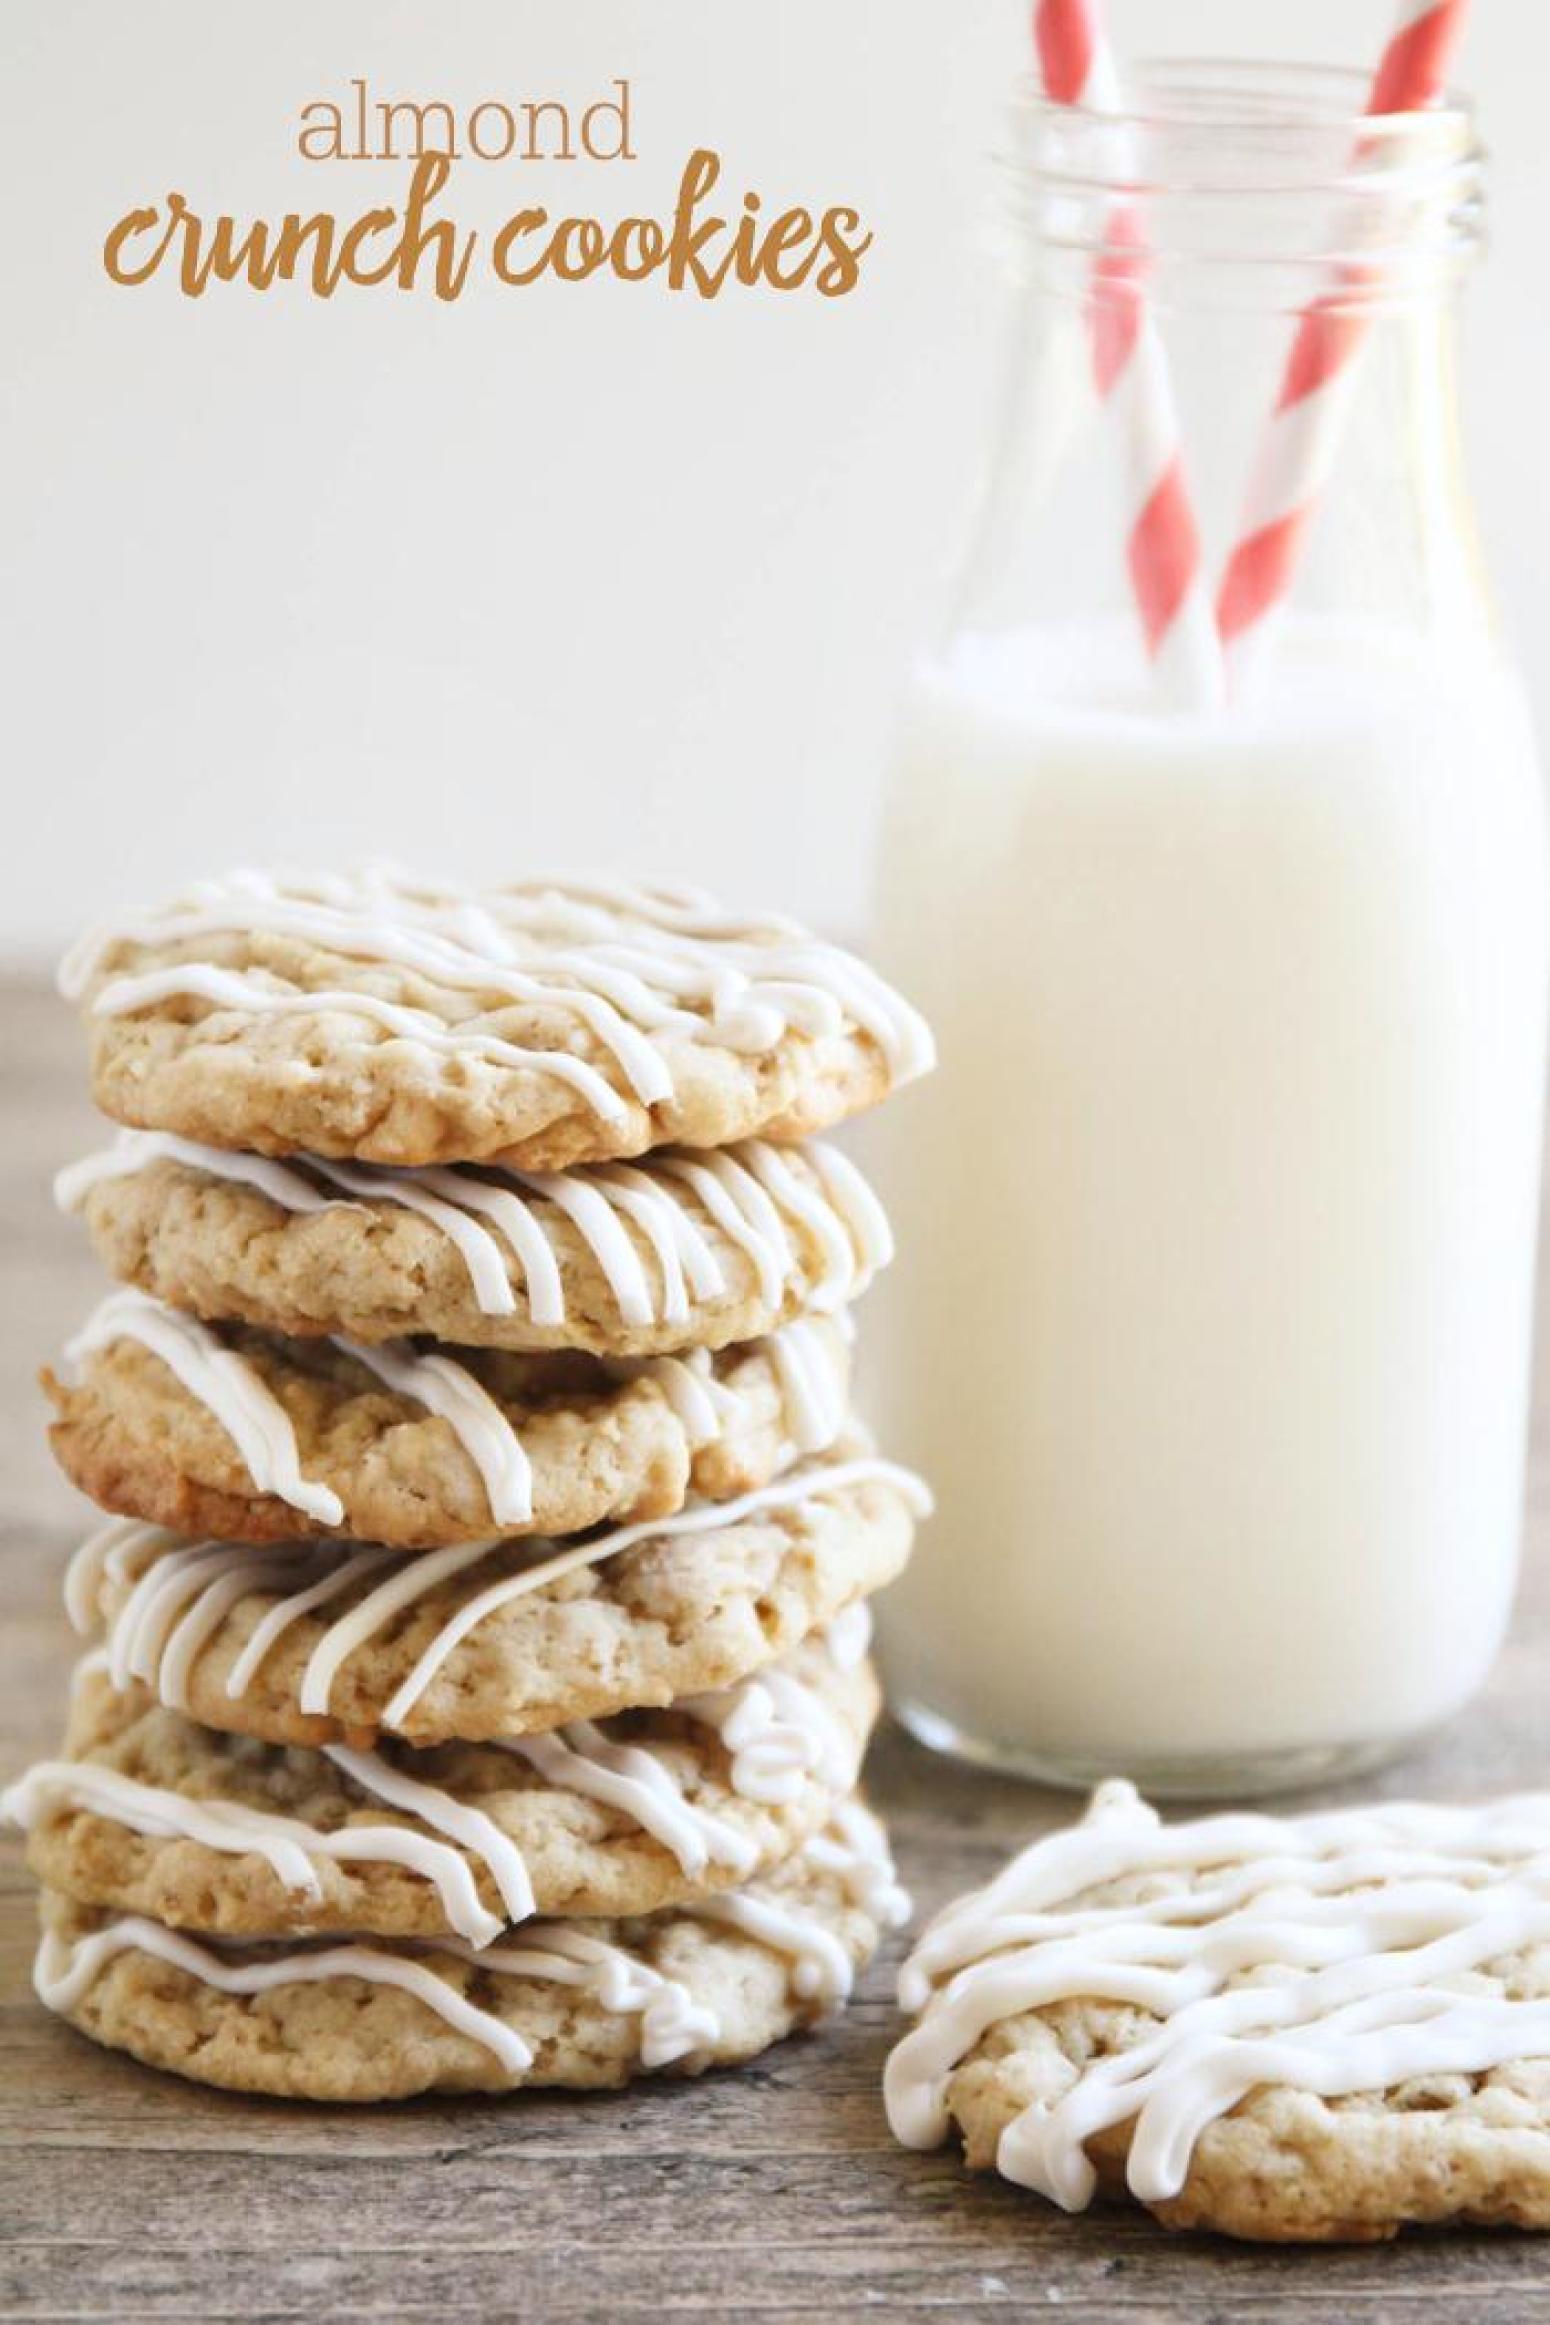 Almond Crunch Cookies Recipe | Just A Pinch Recipes